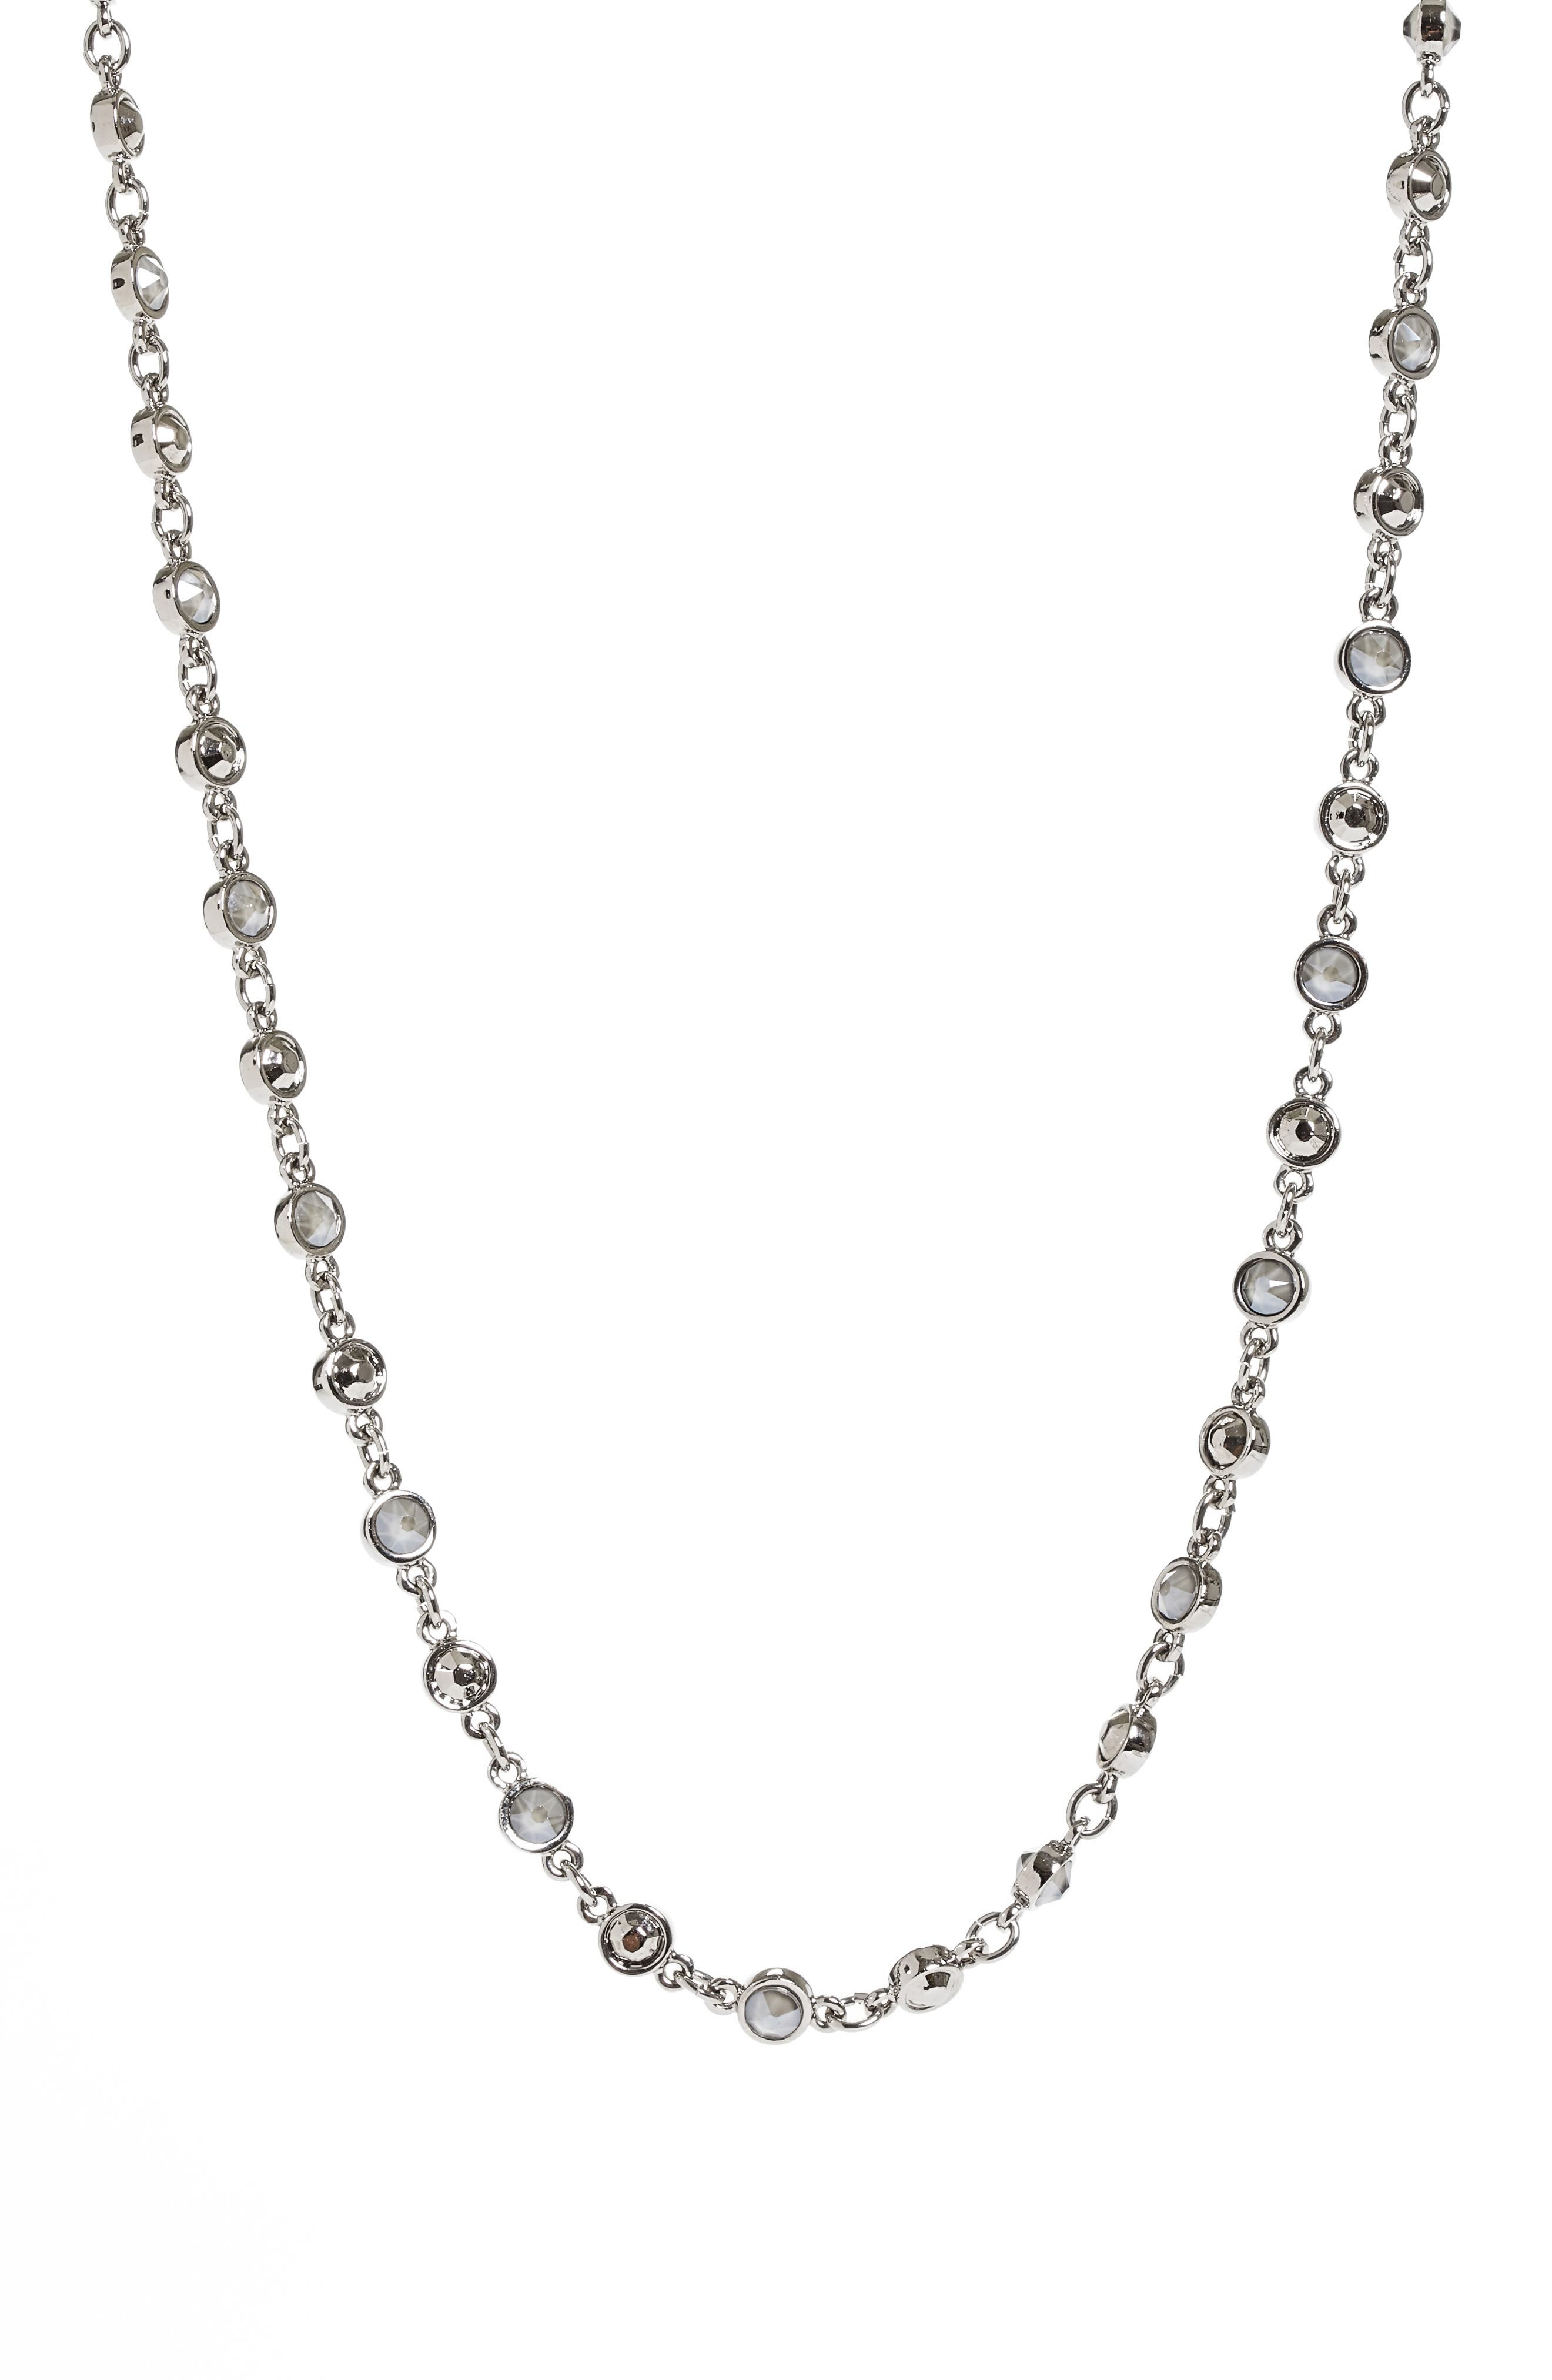 Swarovski Crystal Chain Necklace,                         Main,                         color, Ruthenium/ Crystal Dark Grey